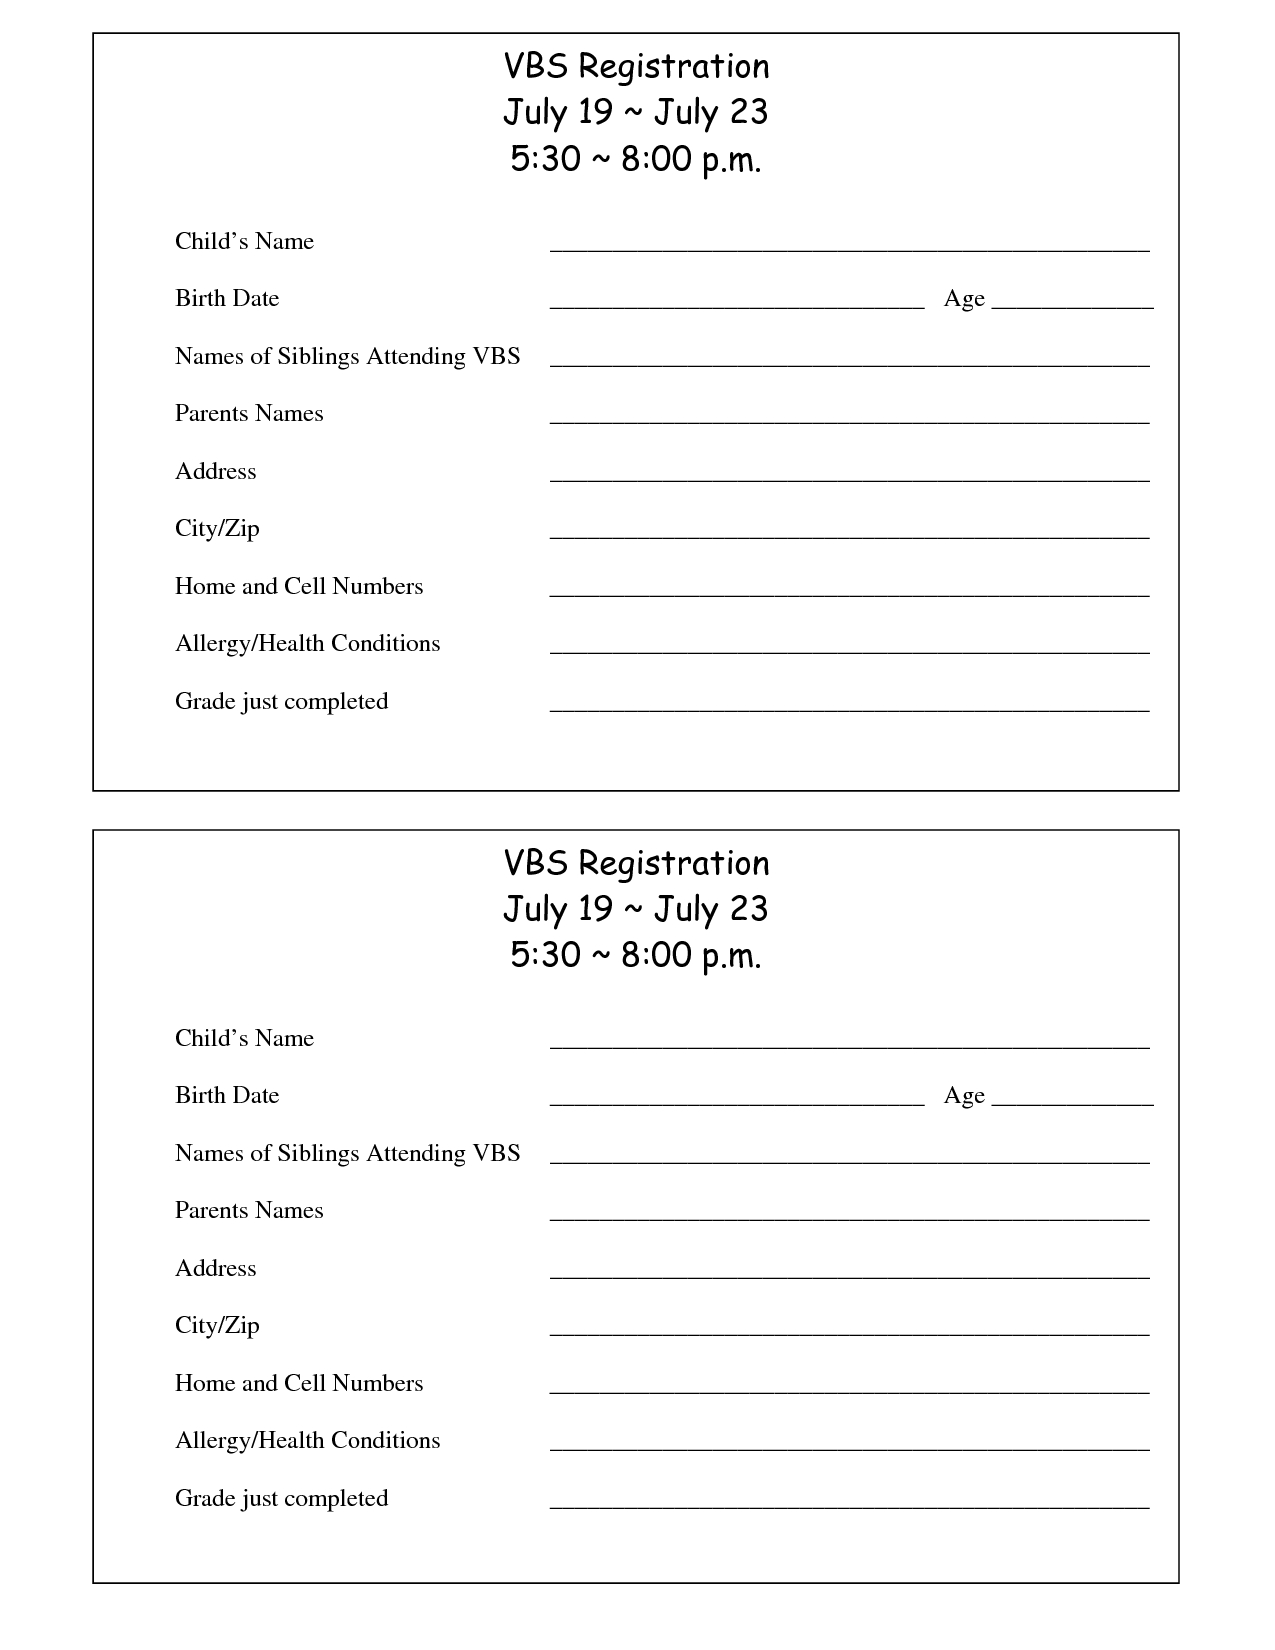 Printable Vbs Registration Form Template | Conference | Registration - Free Printable Vbs Registration Forms